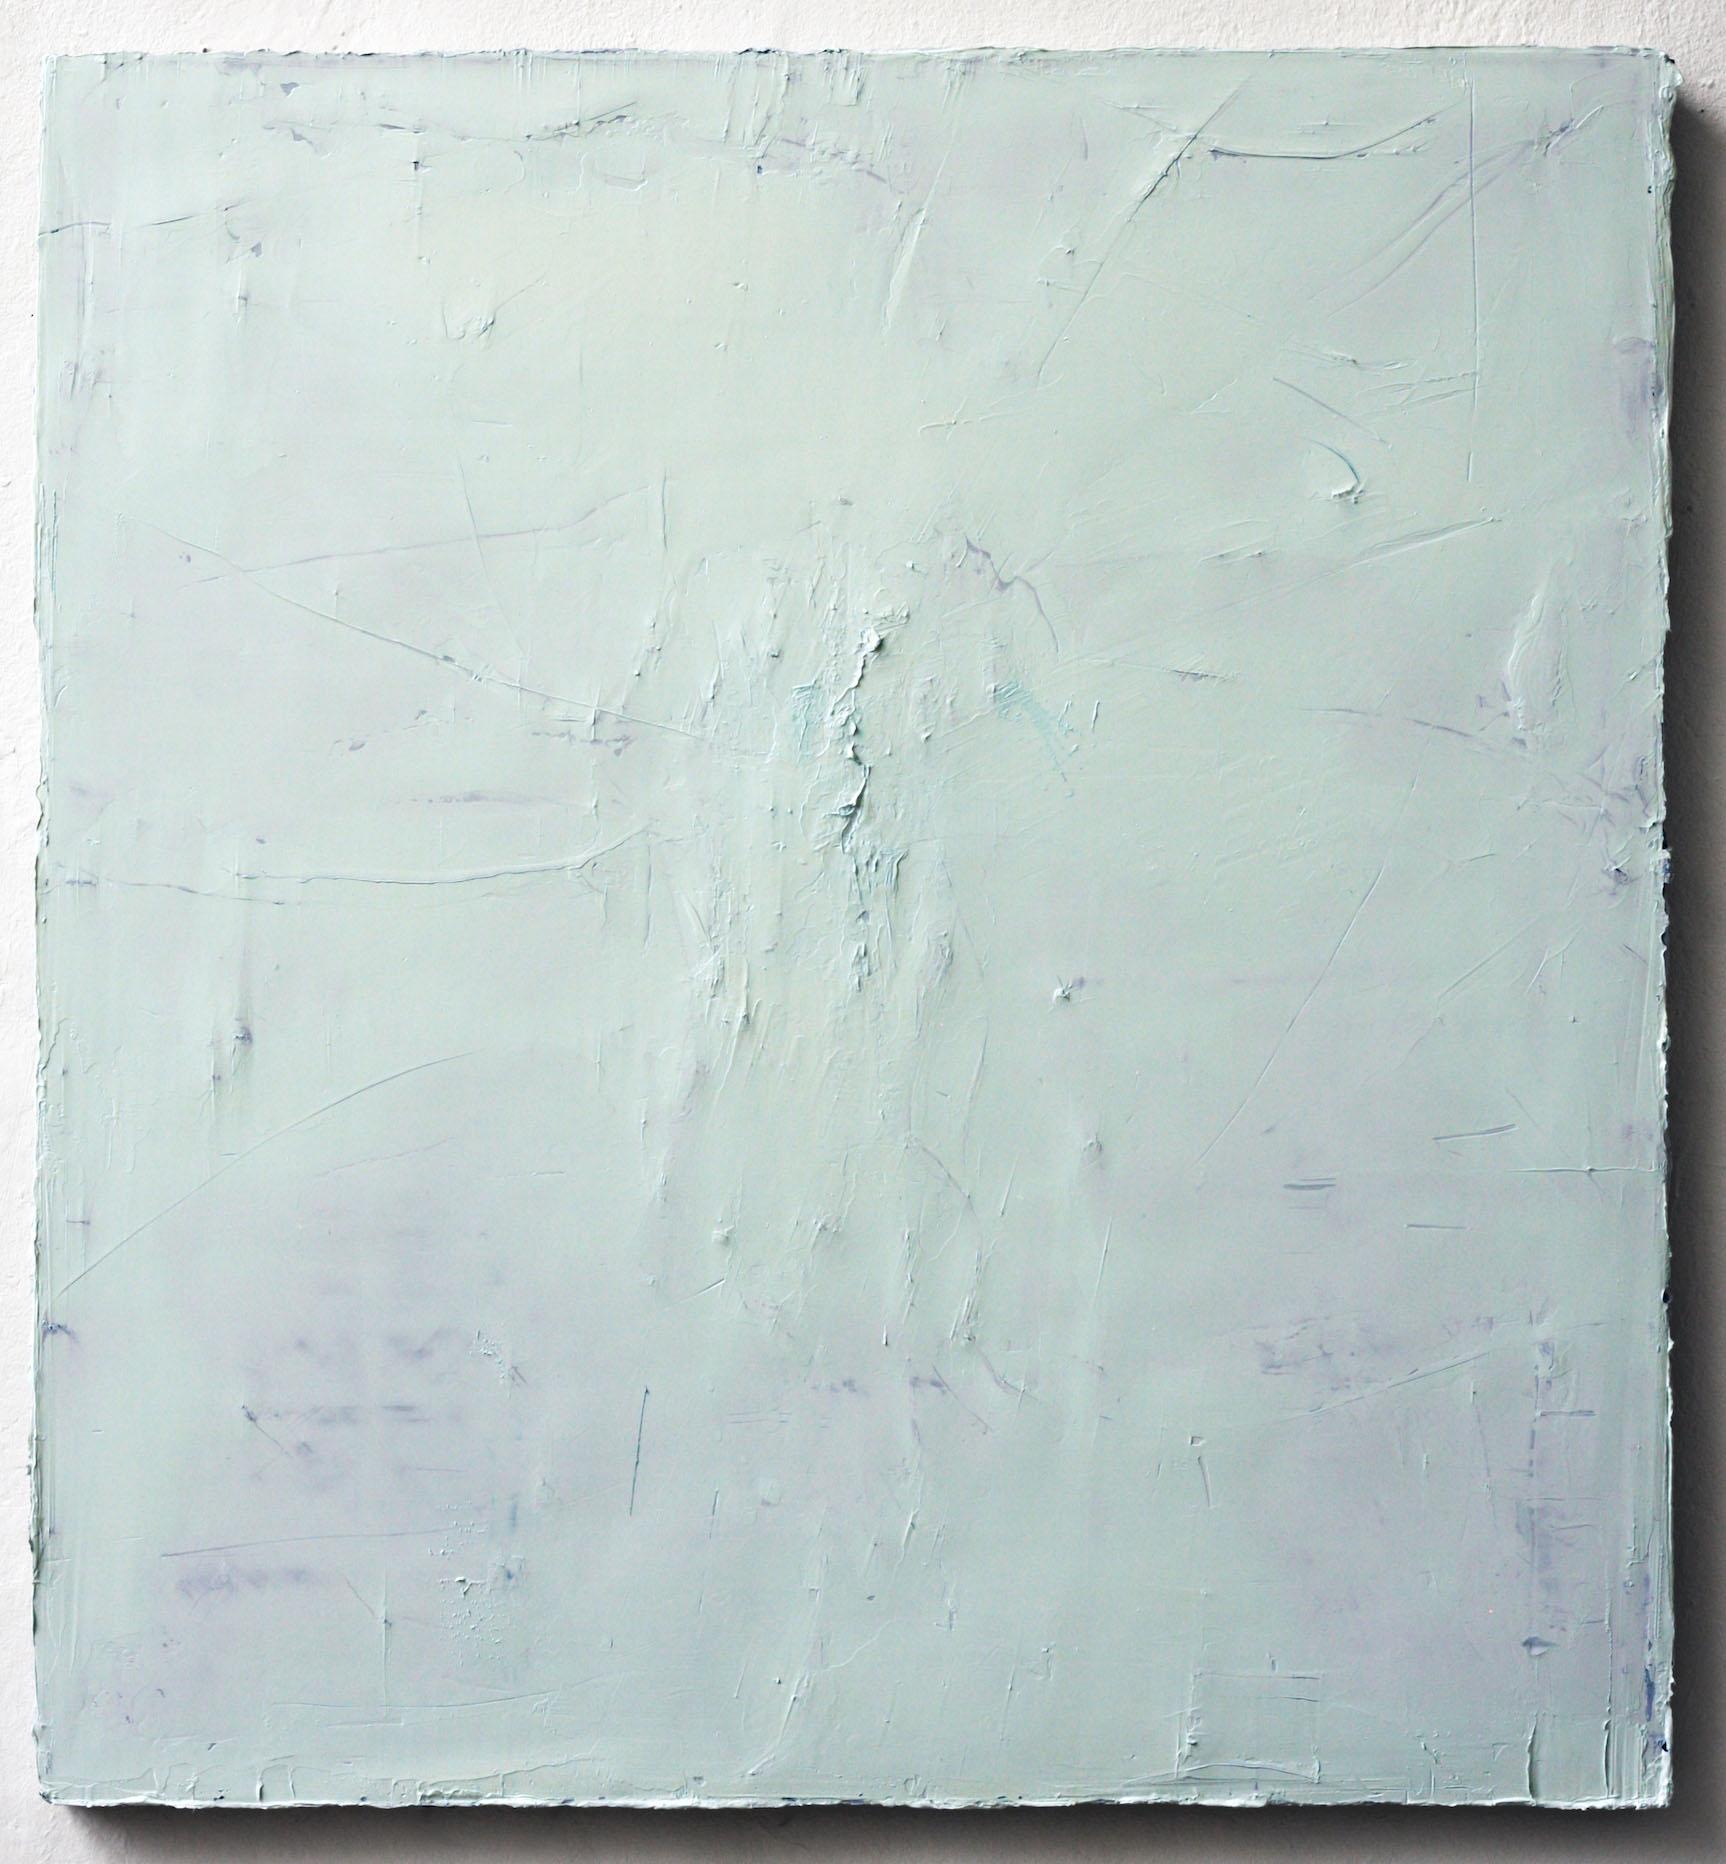 felix-becker_untitled-spine_2020_oil-on-linen_130-x-120-cm_web